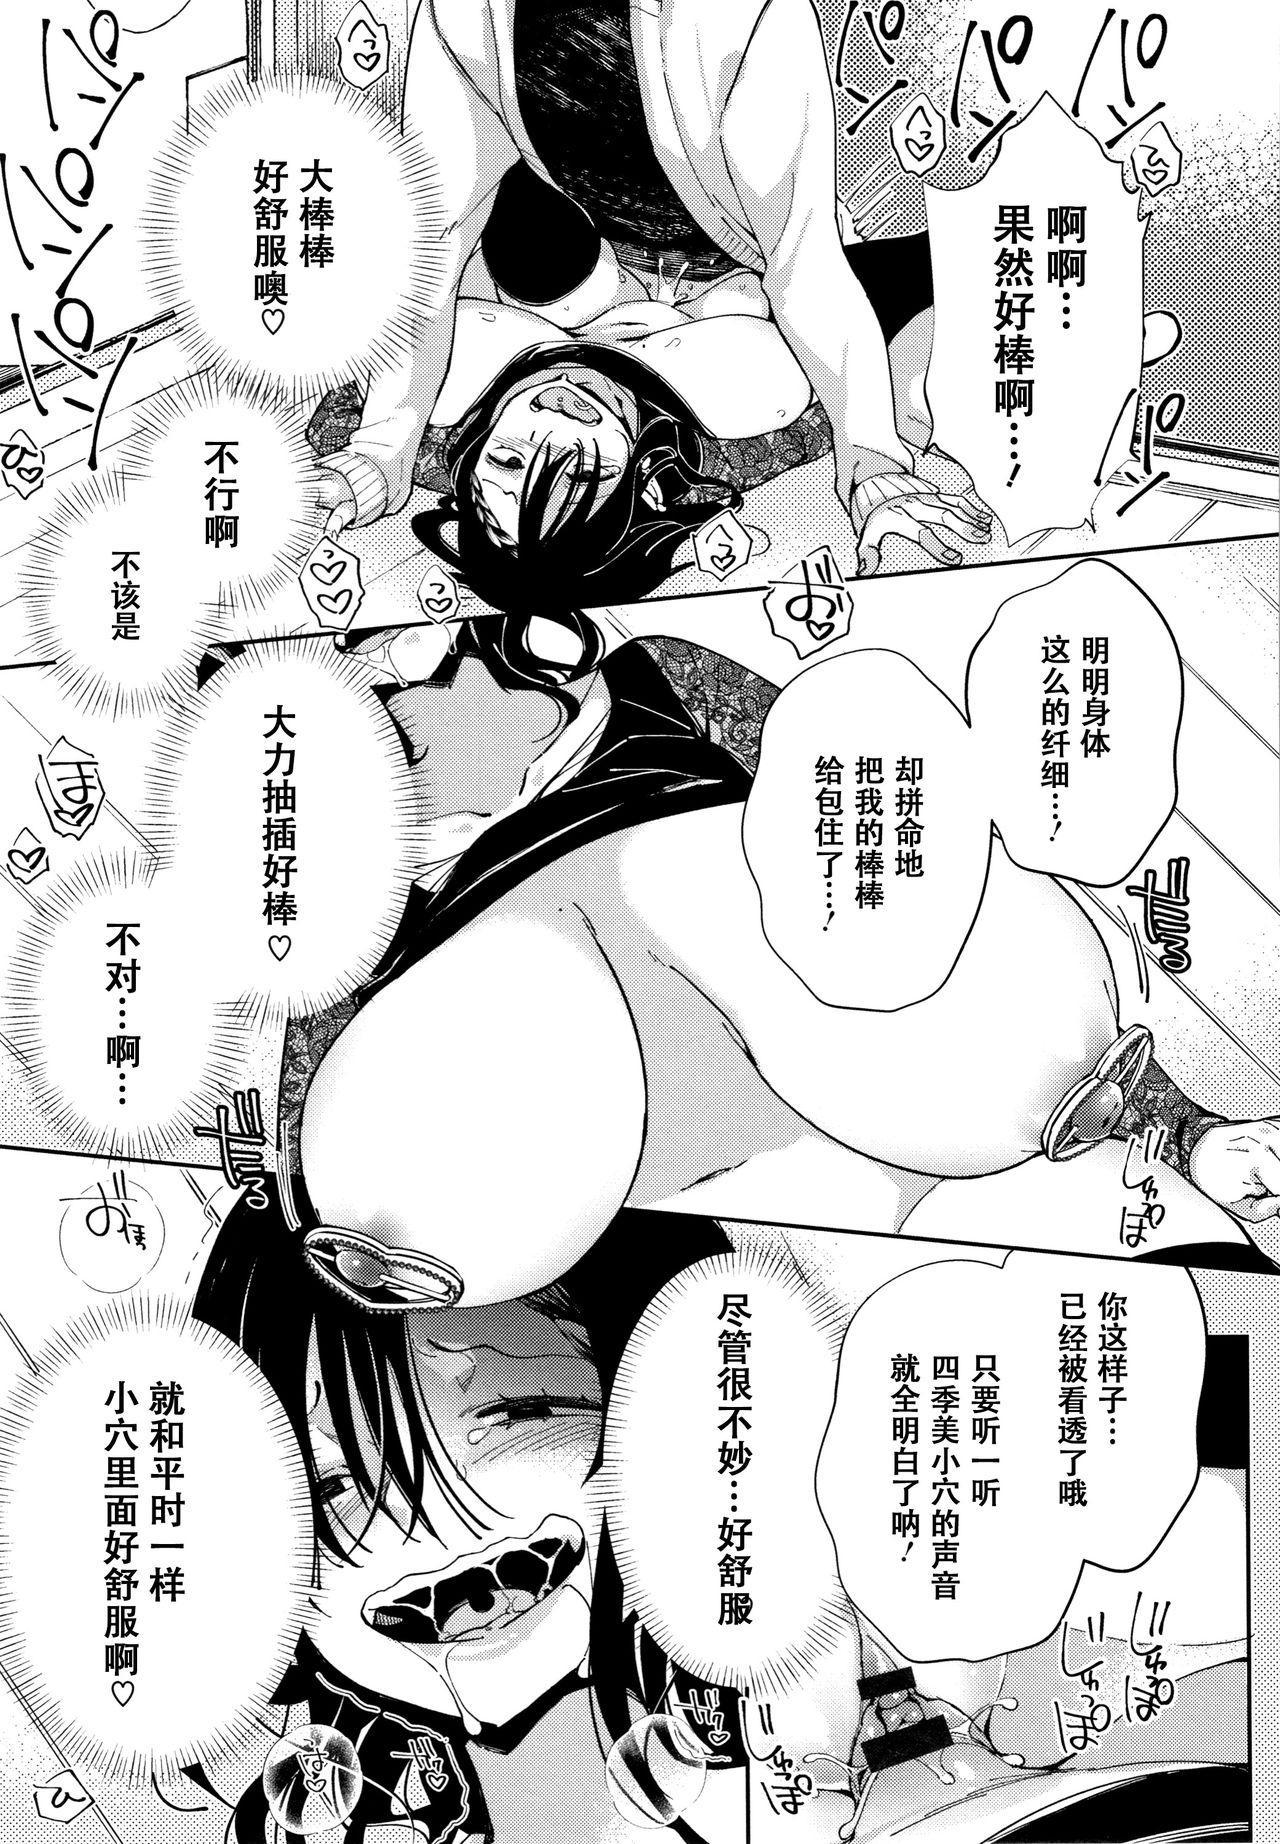 [Achumuchi] Saijaku Gal wa Ikizurai! - The weakest pussy is hard to go.ch.1-8 [Chinese] [战栗的玻璃棒汉化] [Ongoing] 143